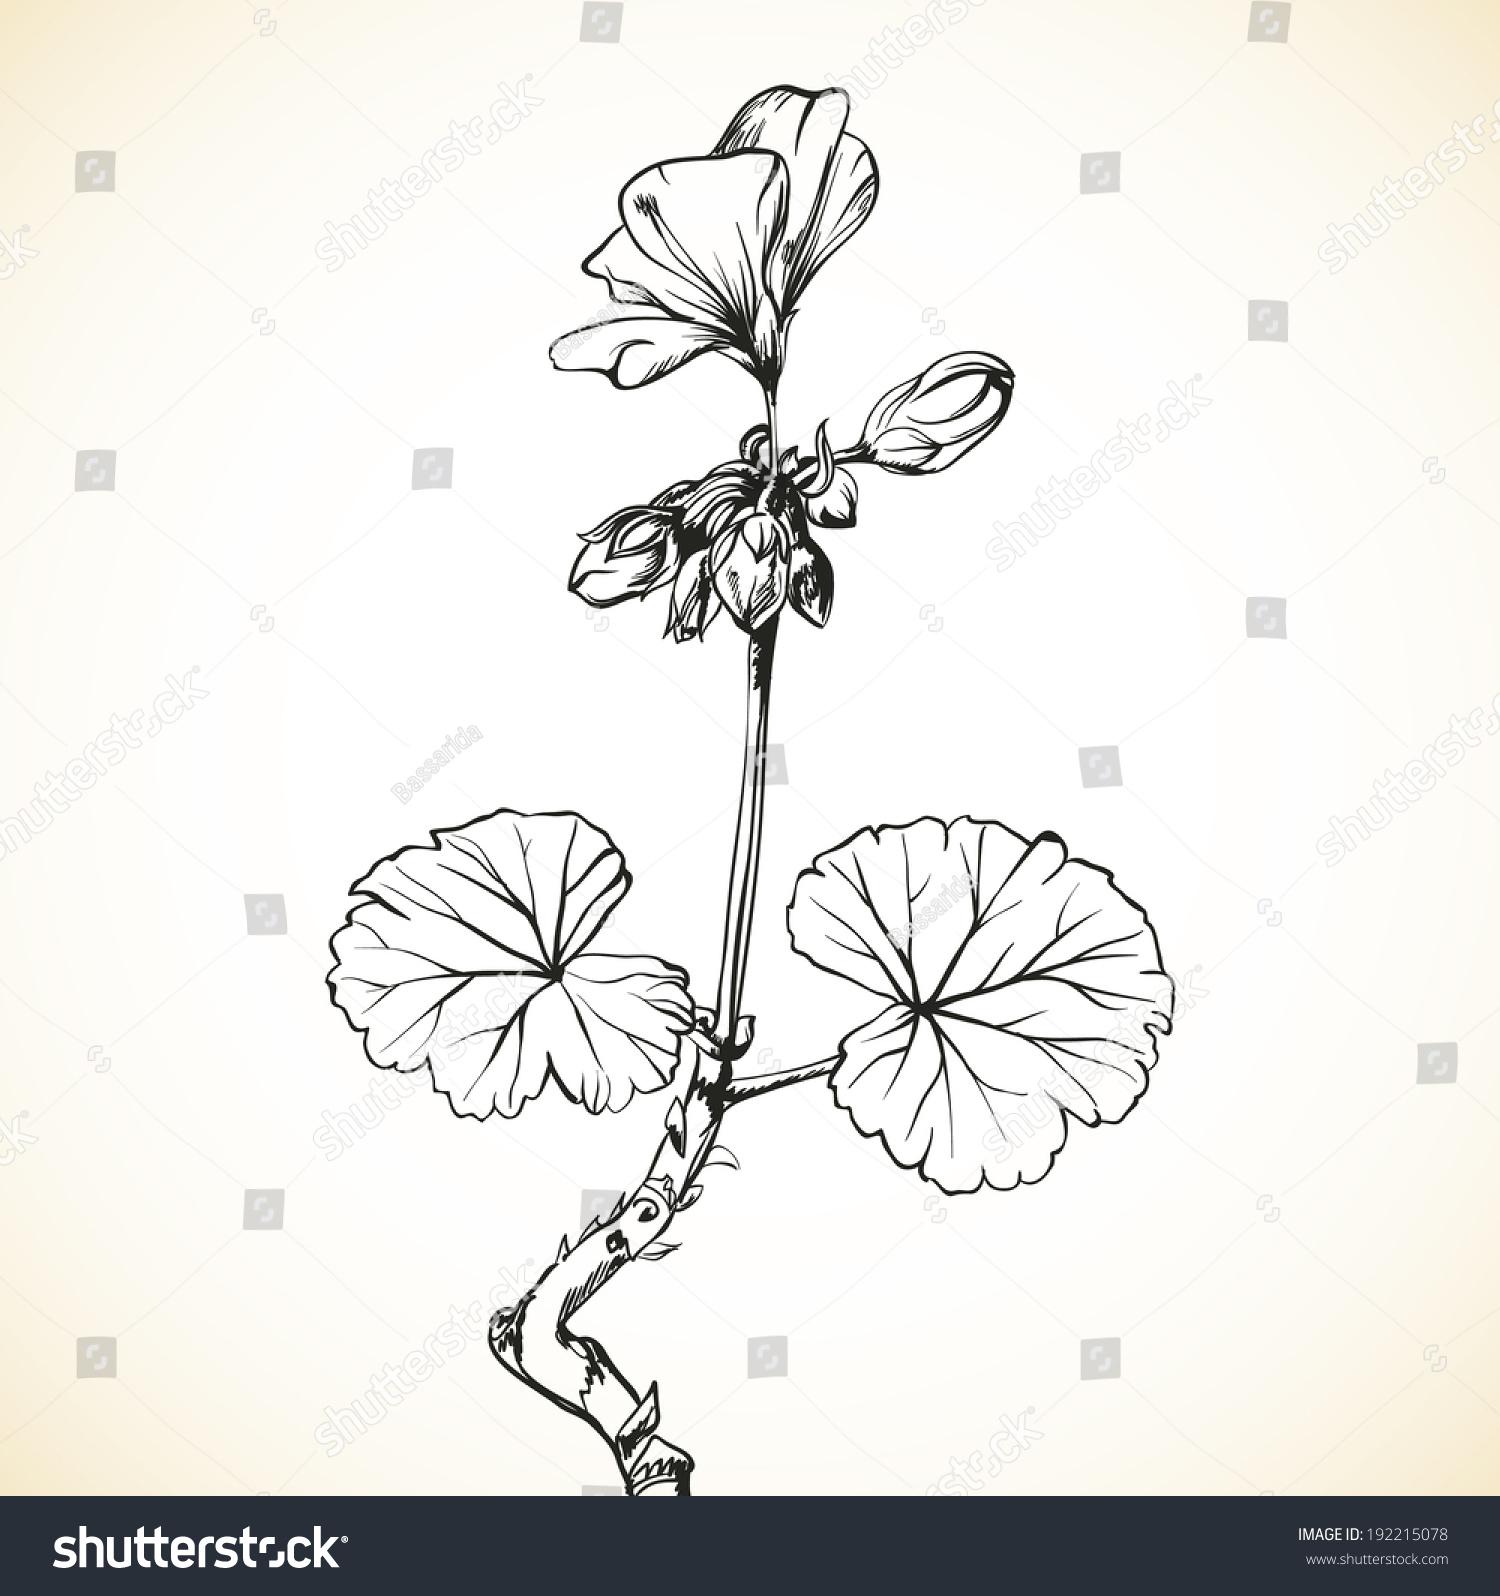 artistic hand drawn geranium flower